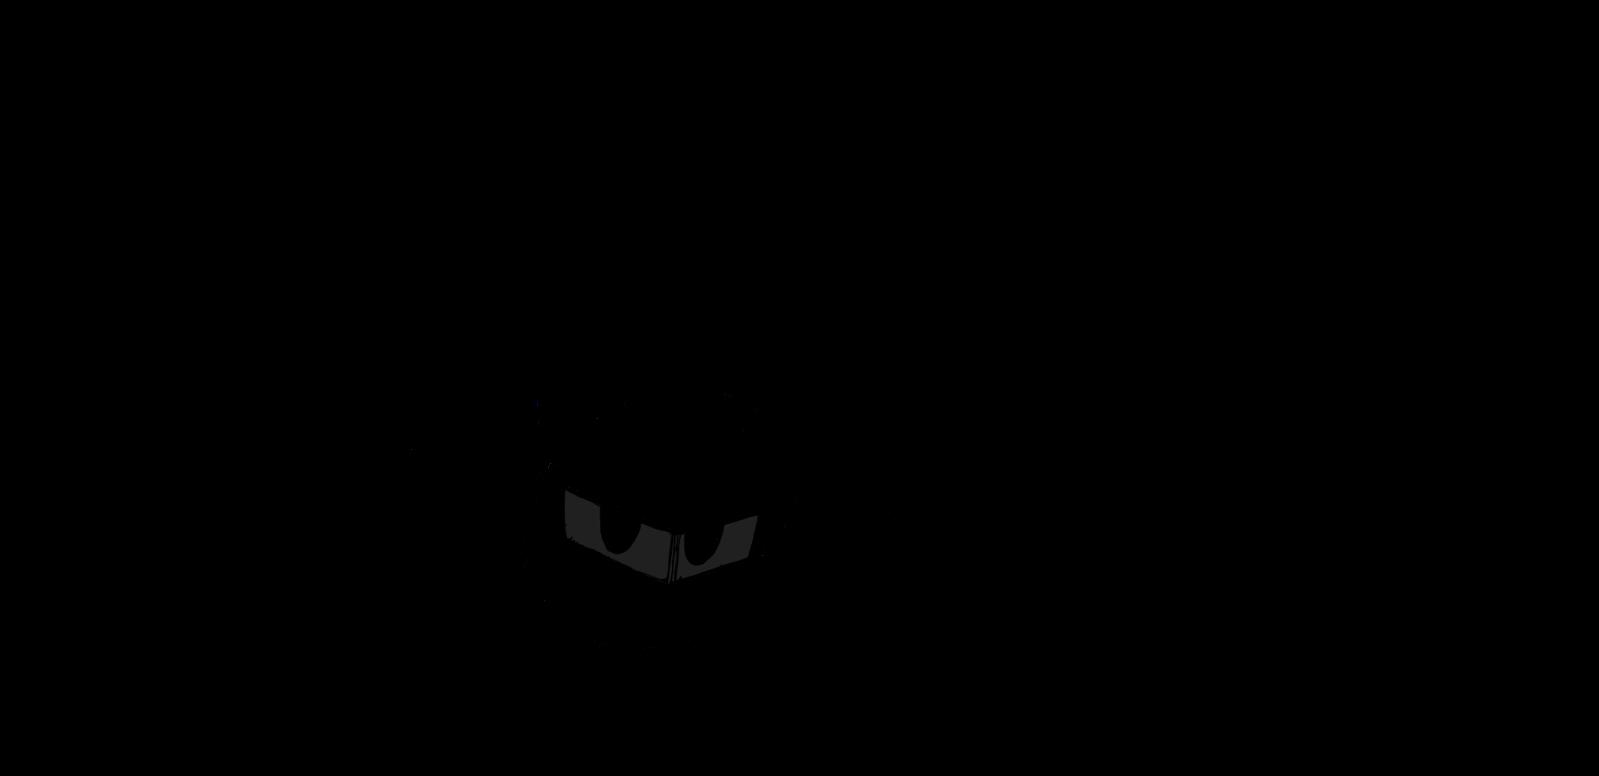 1599x776 Meta Knight#39s Video Game Art